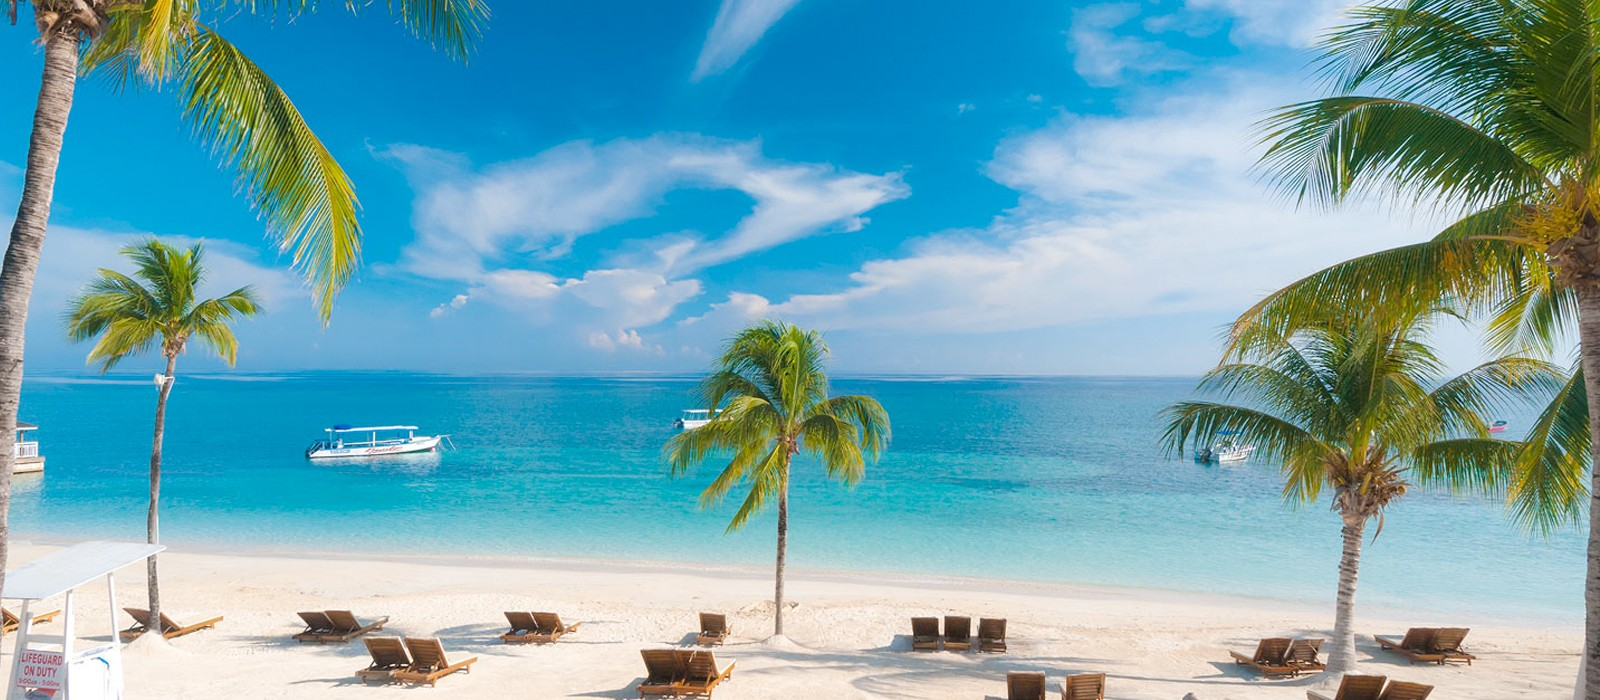 Beaches Ocho Rios - Header